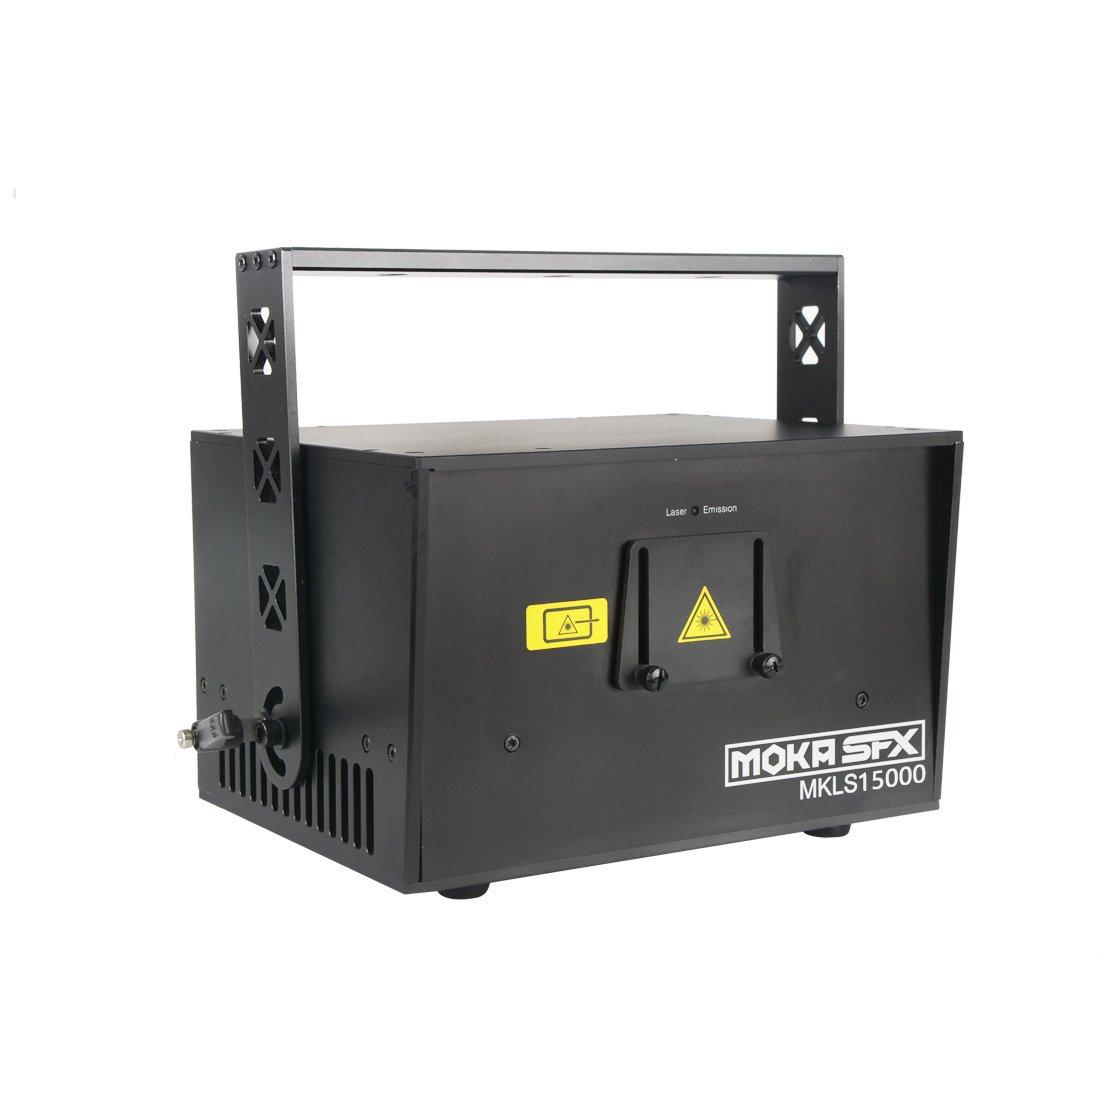 15w laser light